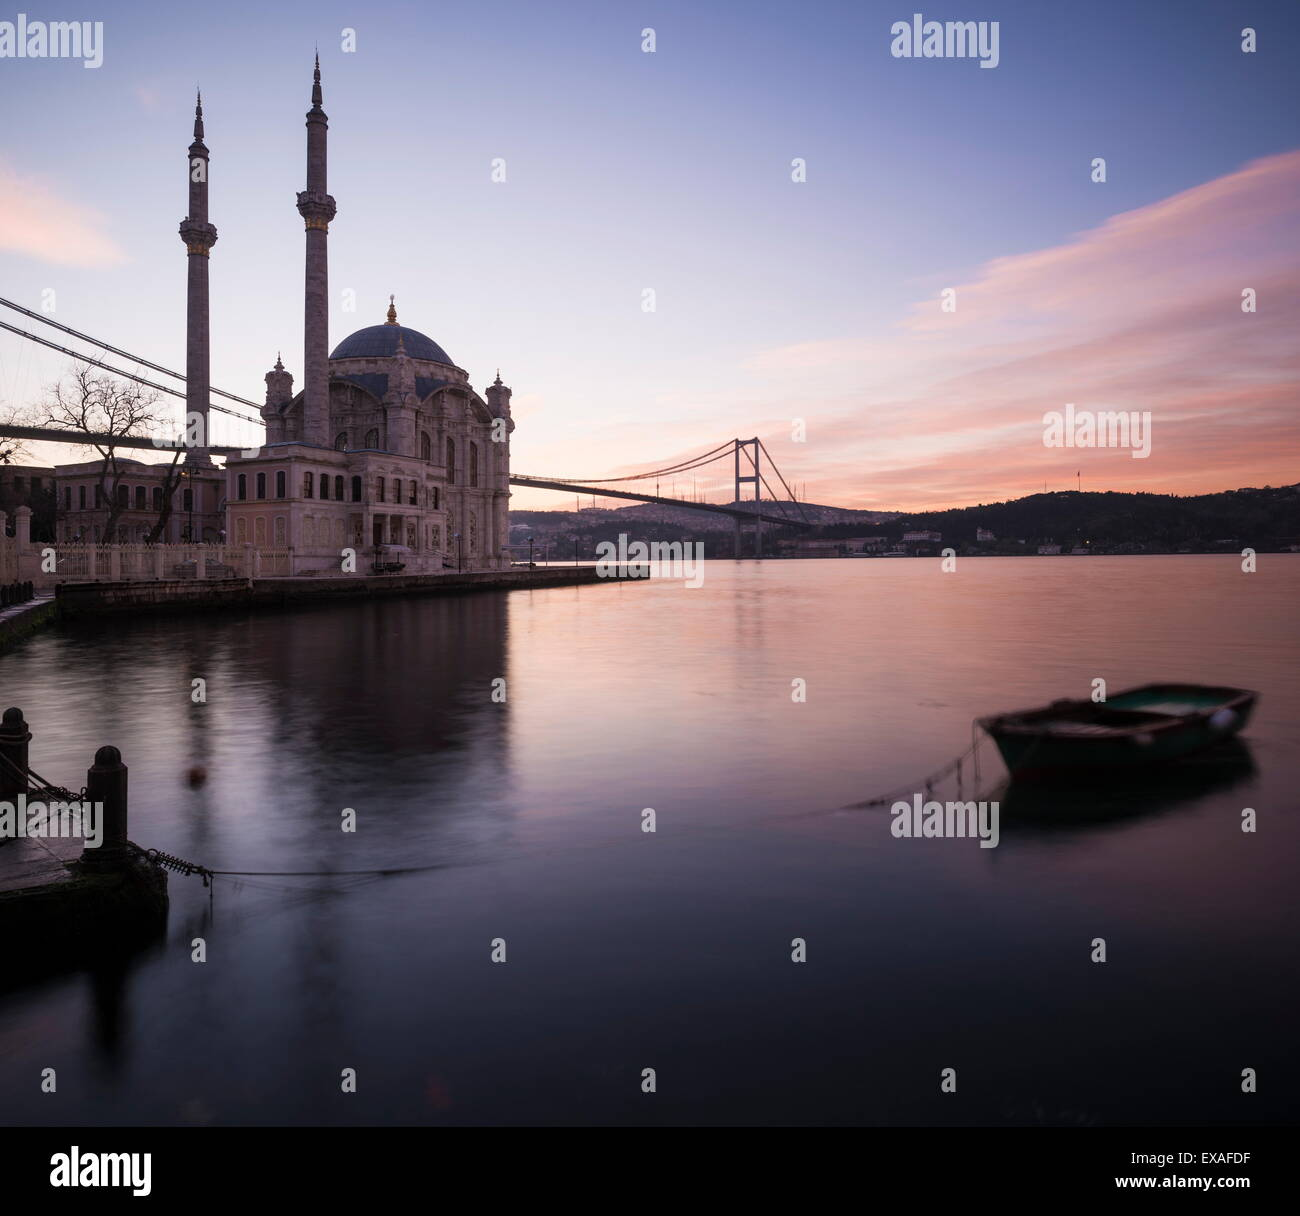 Äußere Ortakoy-Moschee und Bosporus Brücke bei Dämmerung, Ortakoy, Istanbul, Türkei, Europa Stockbild